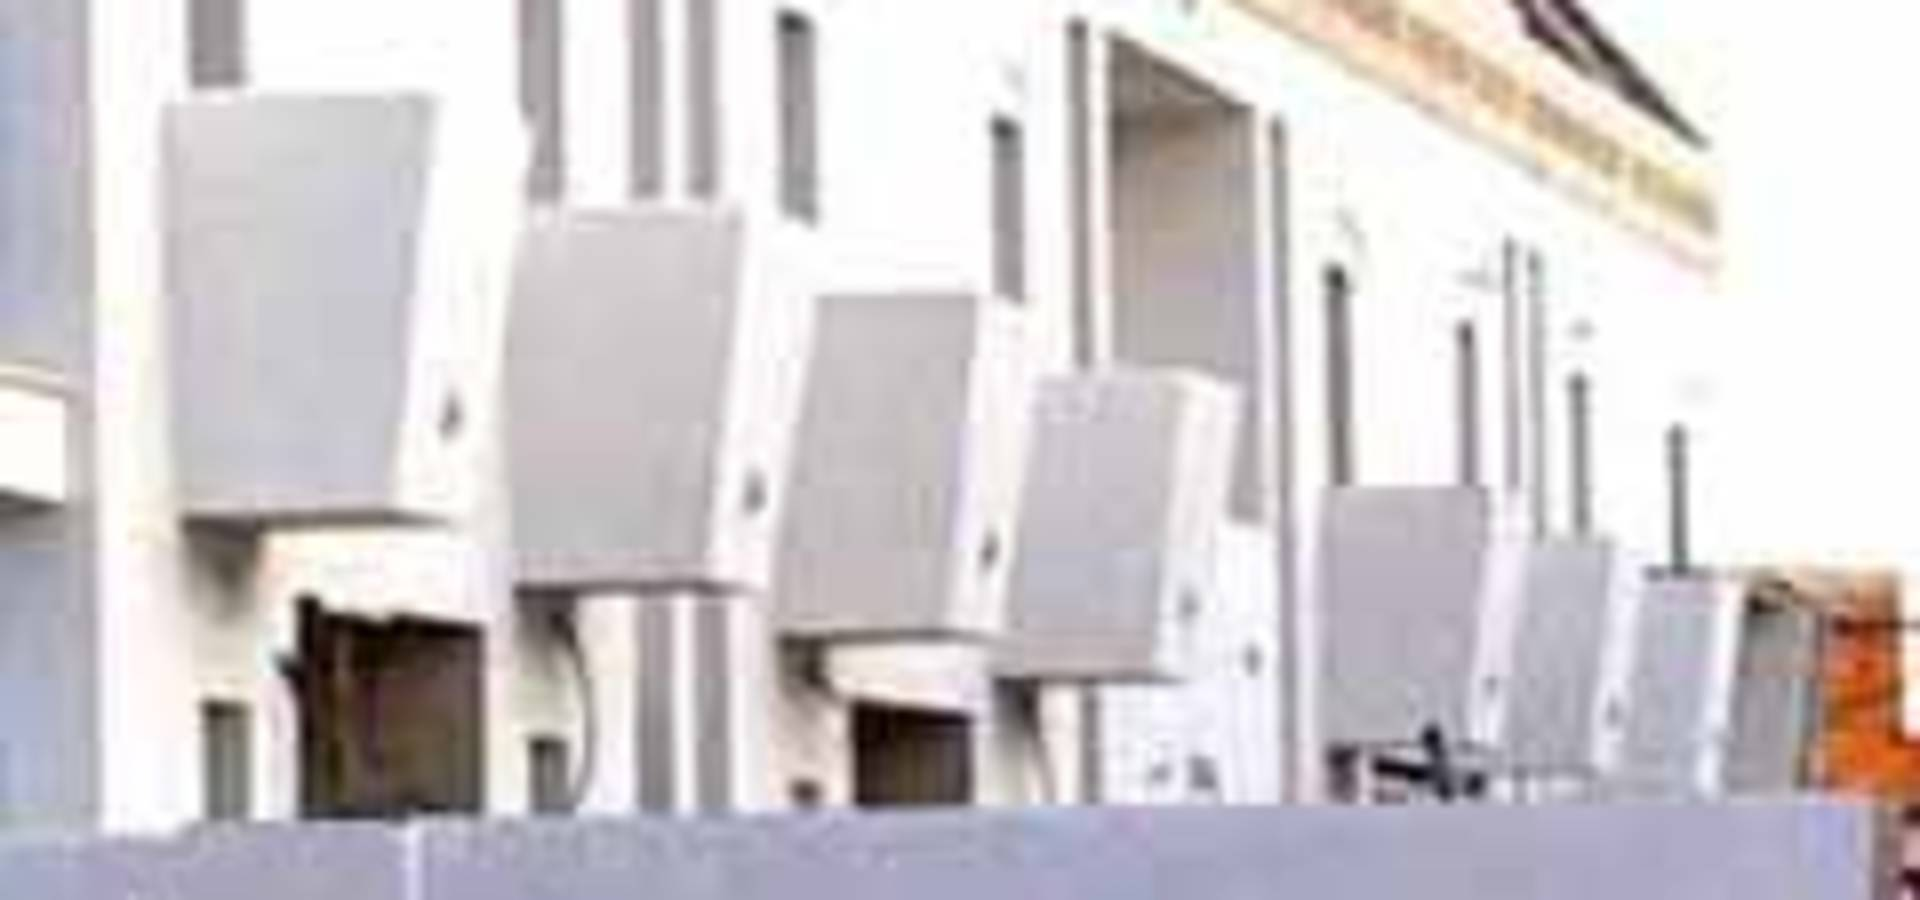 Estudio de arquitectura arquitectos en barcelona homify - Estudios de arquitectura en bilbao ...